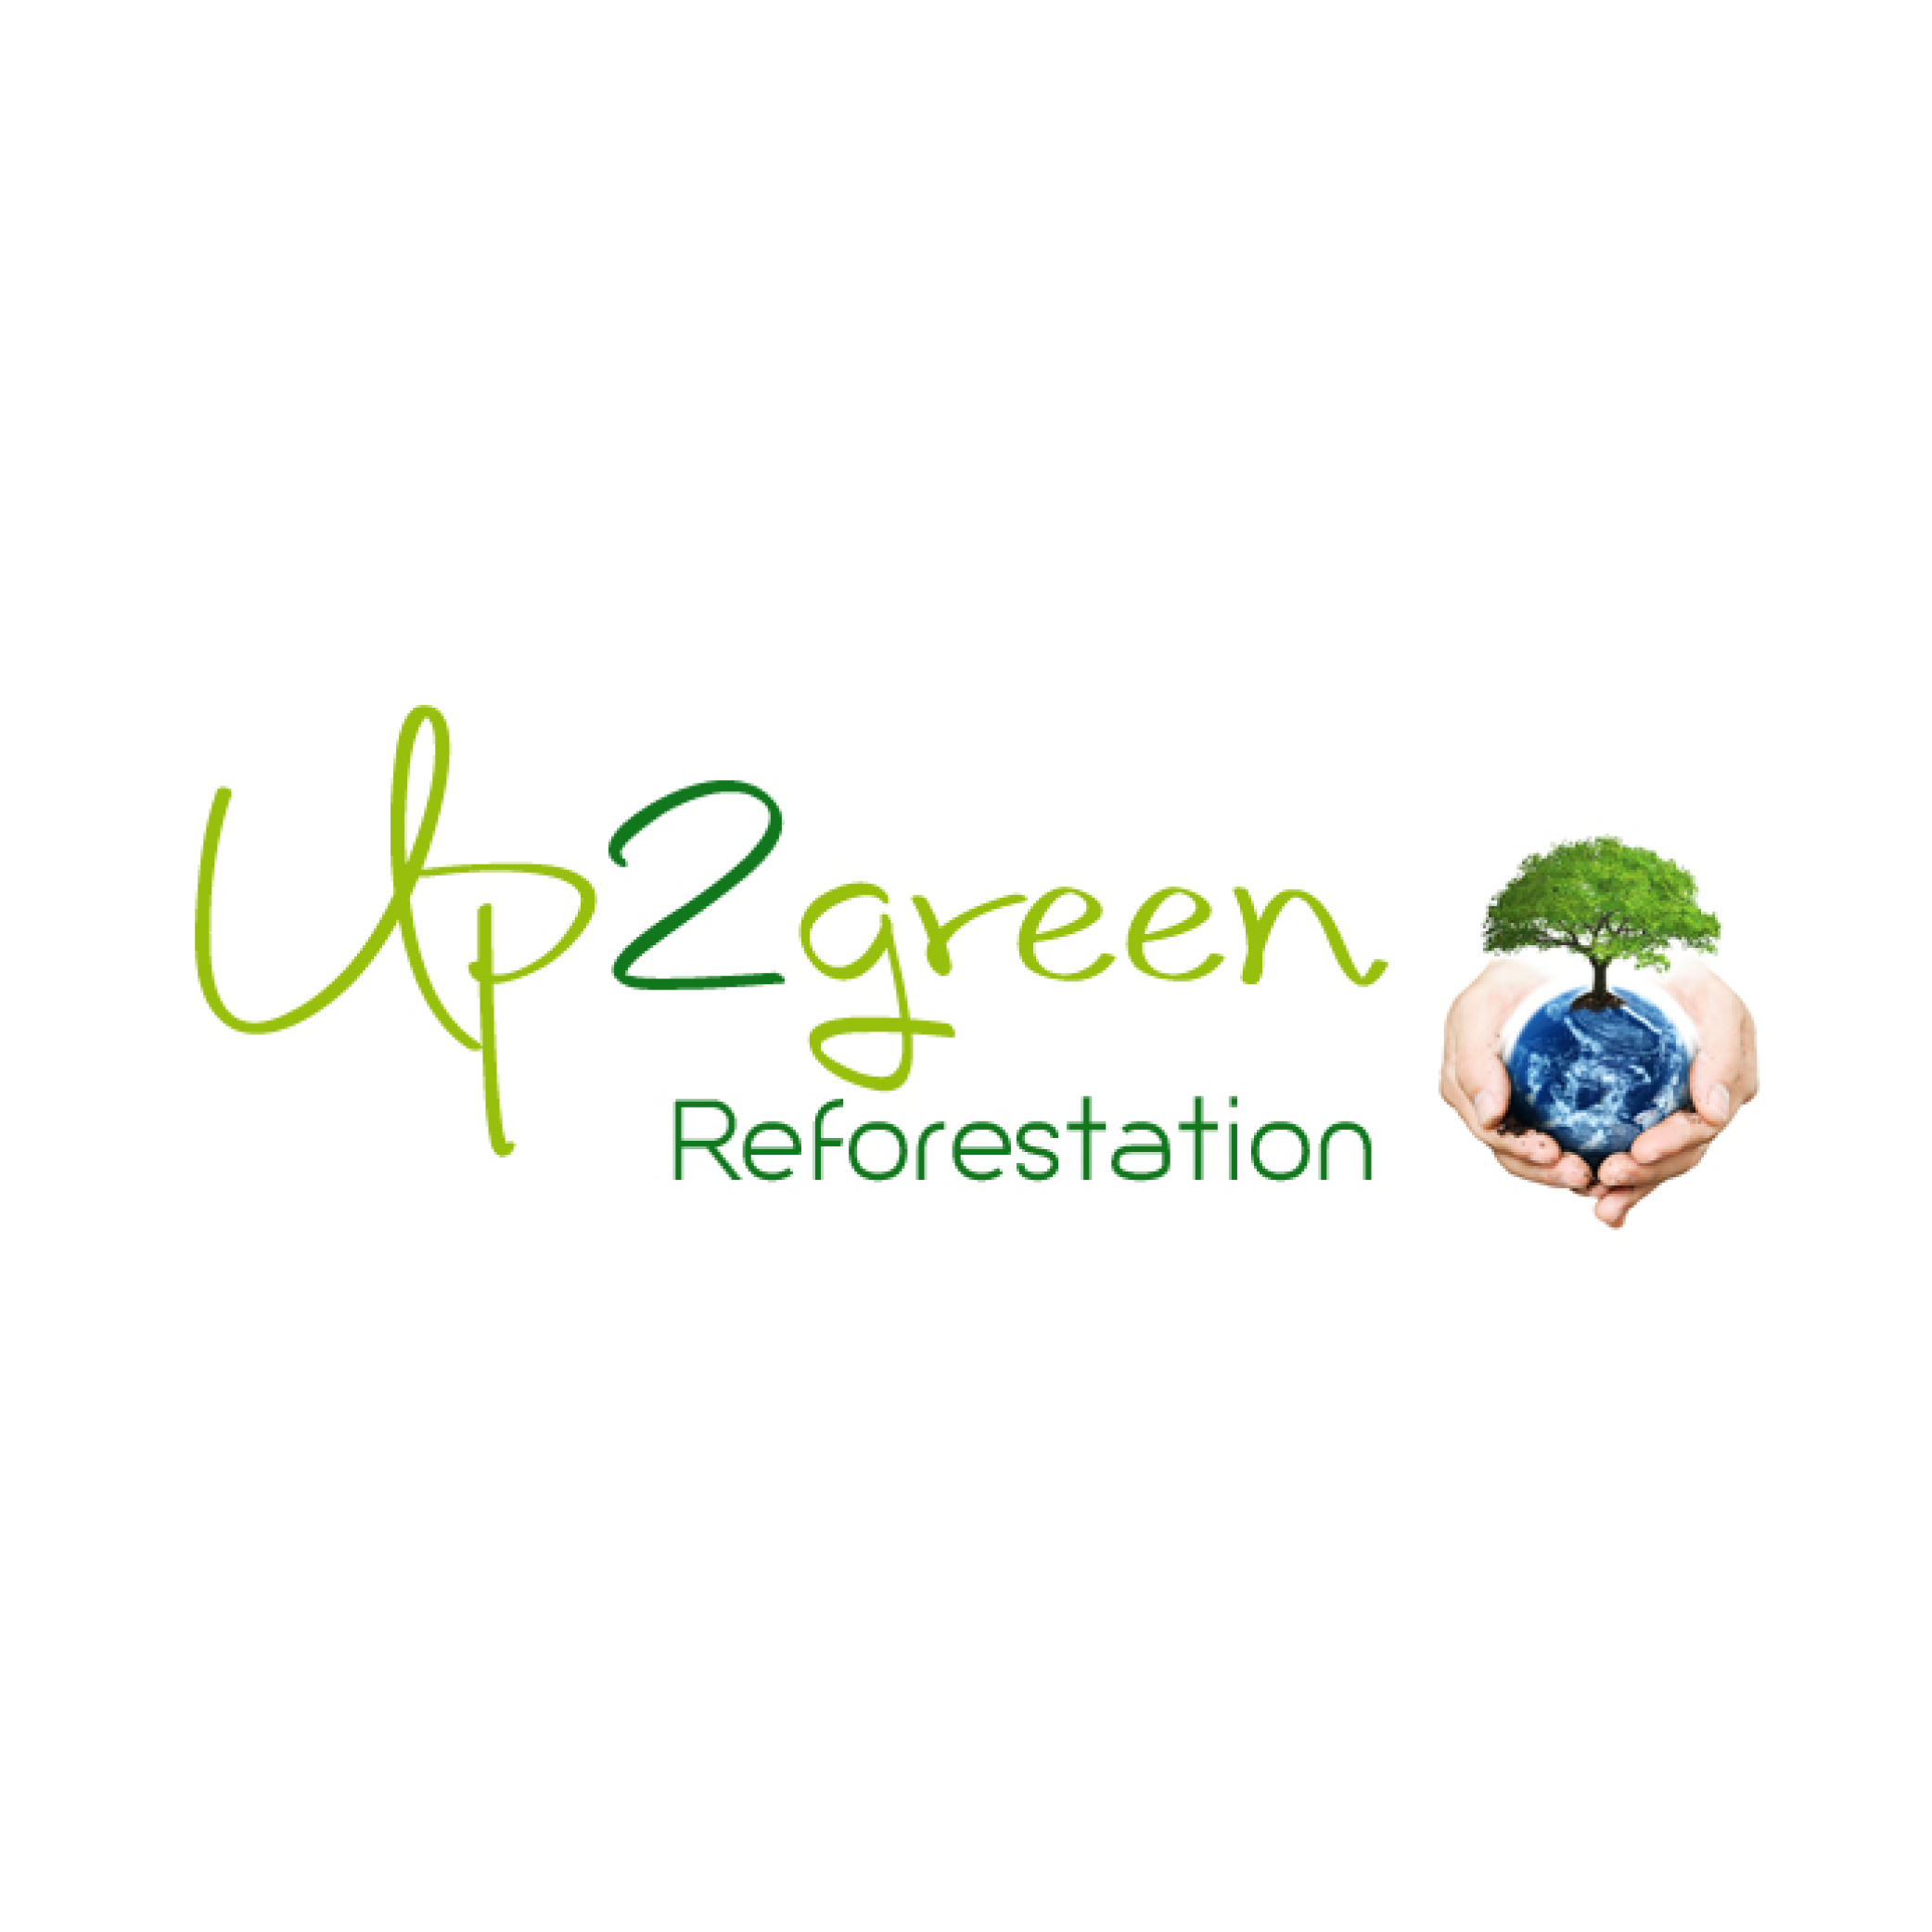 up2green reforestation